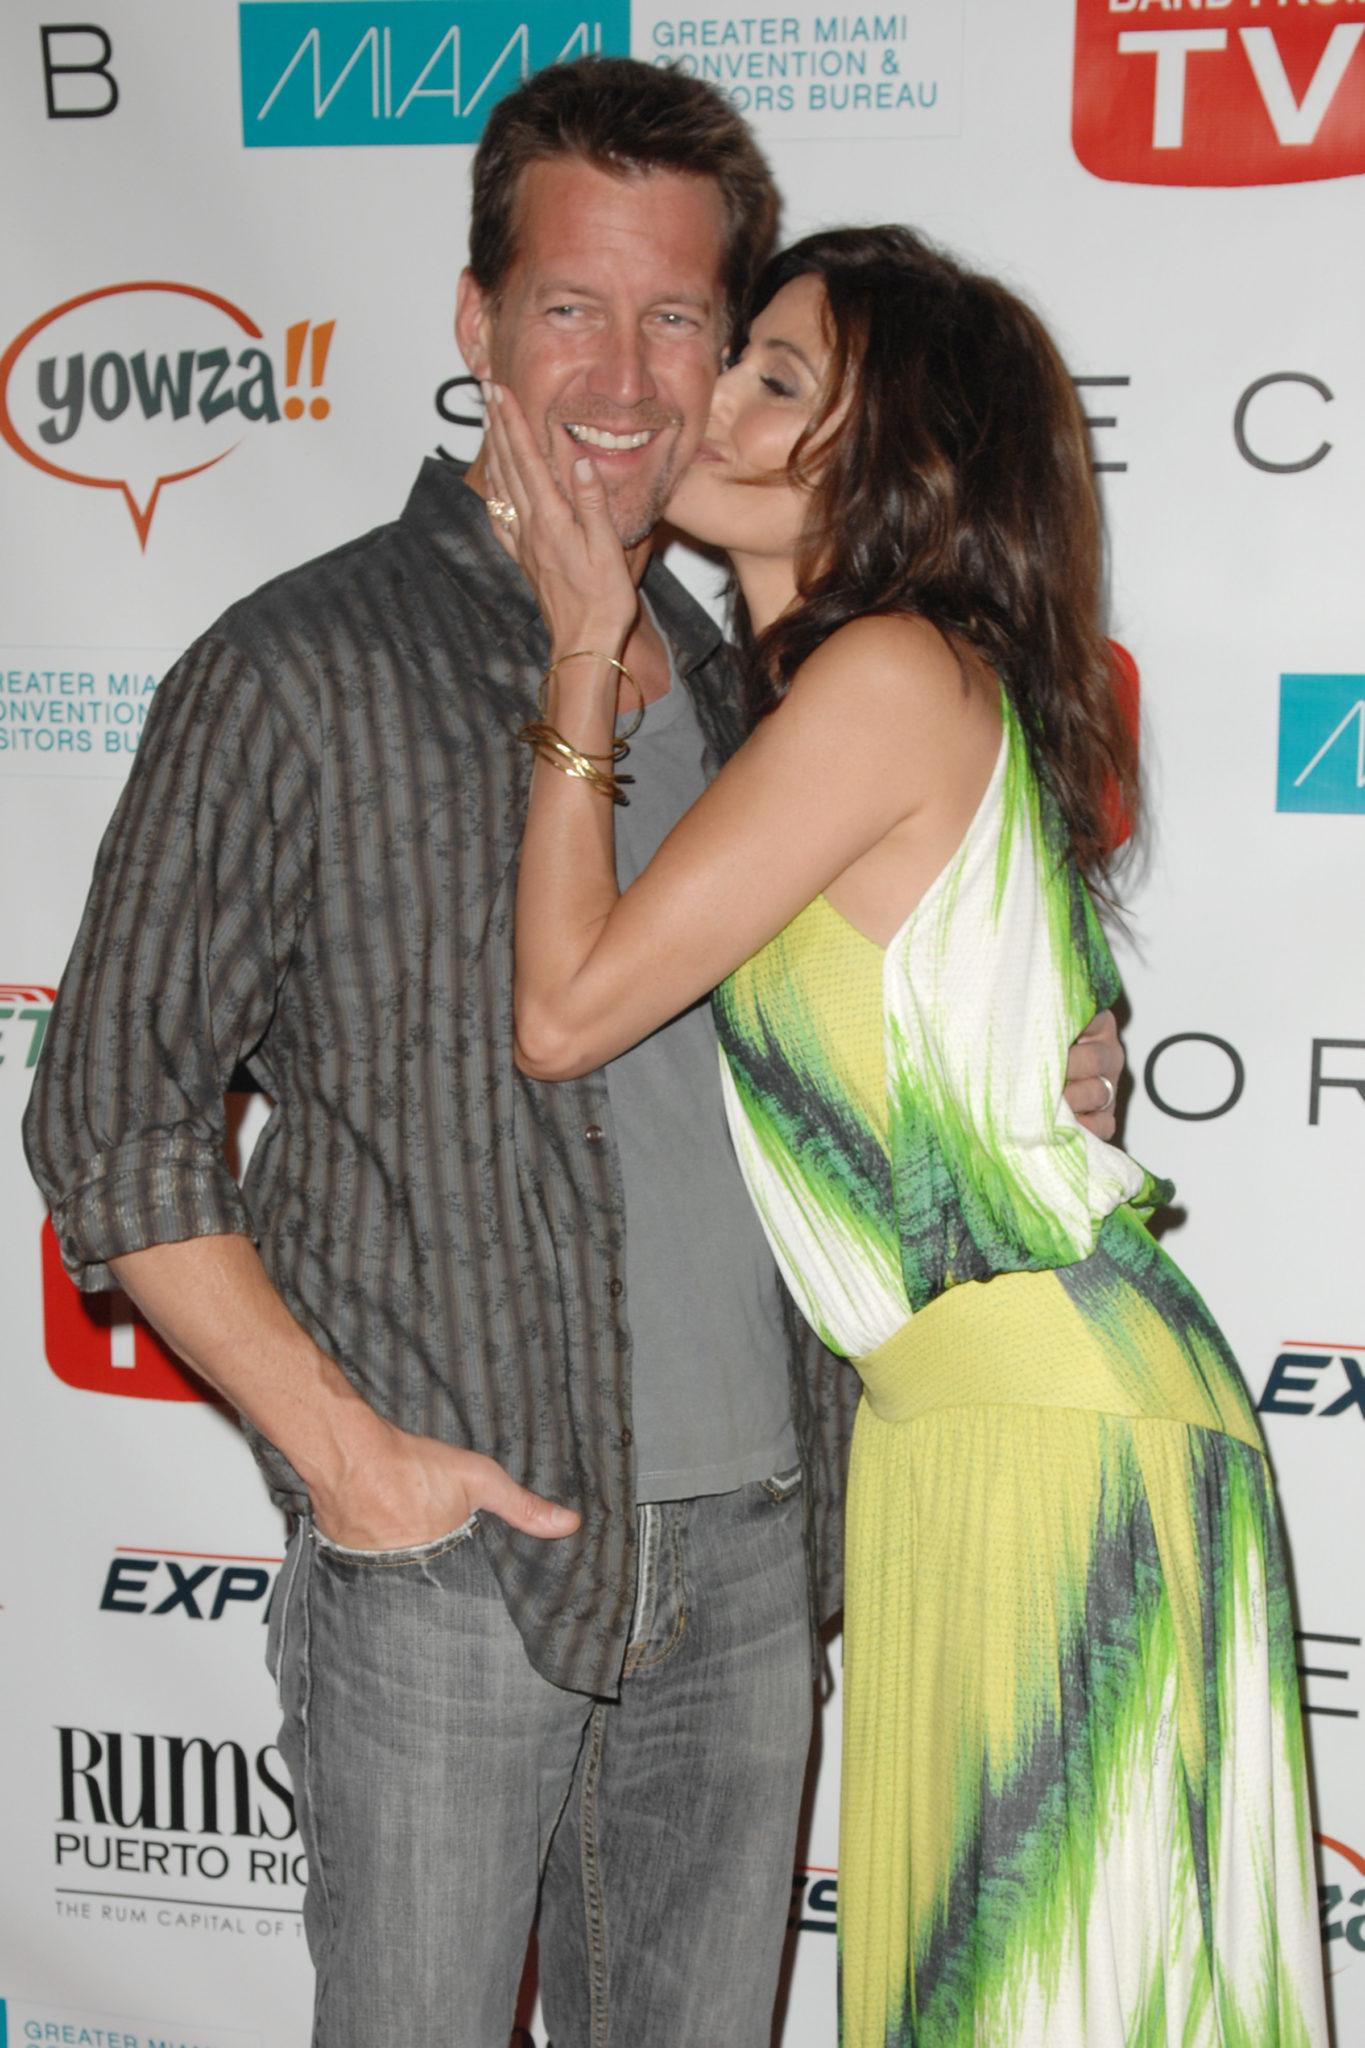 Desperate Housewives James Denton and Teri Hatcher